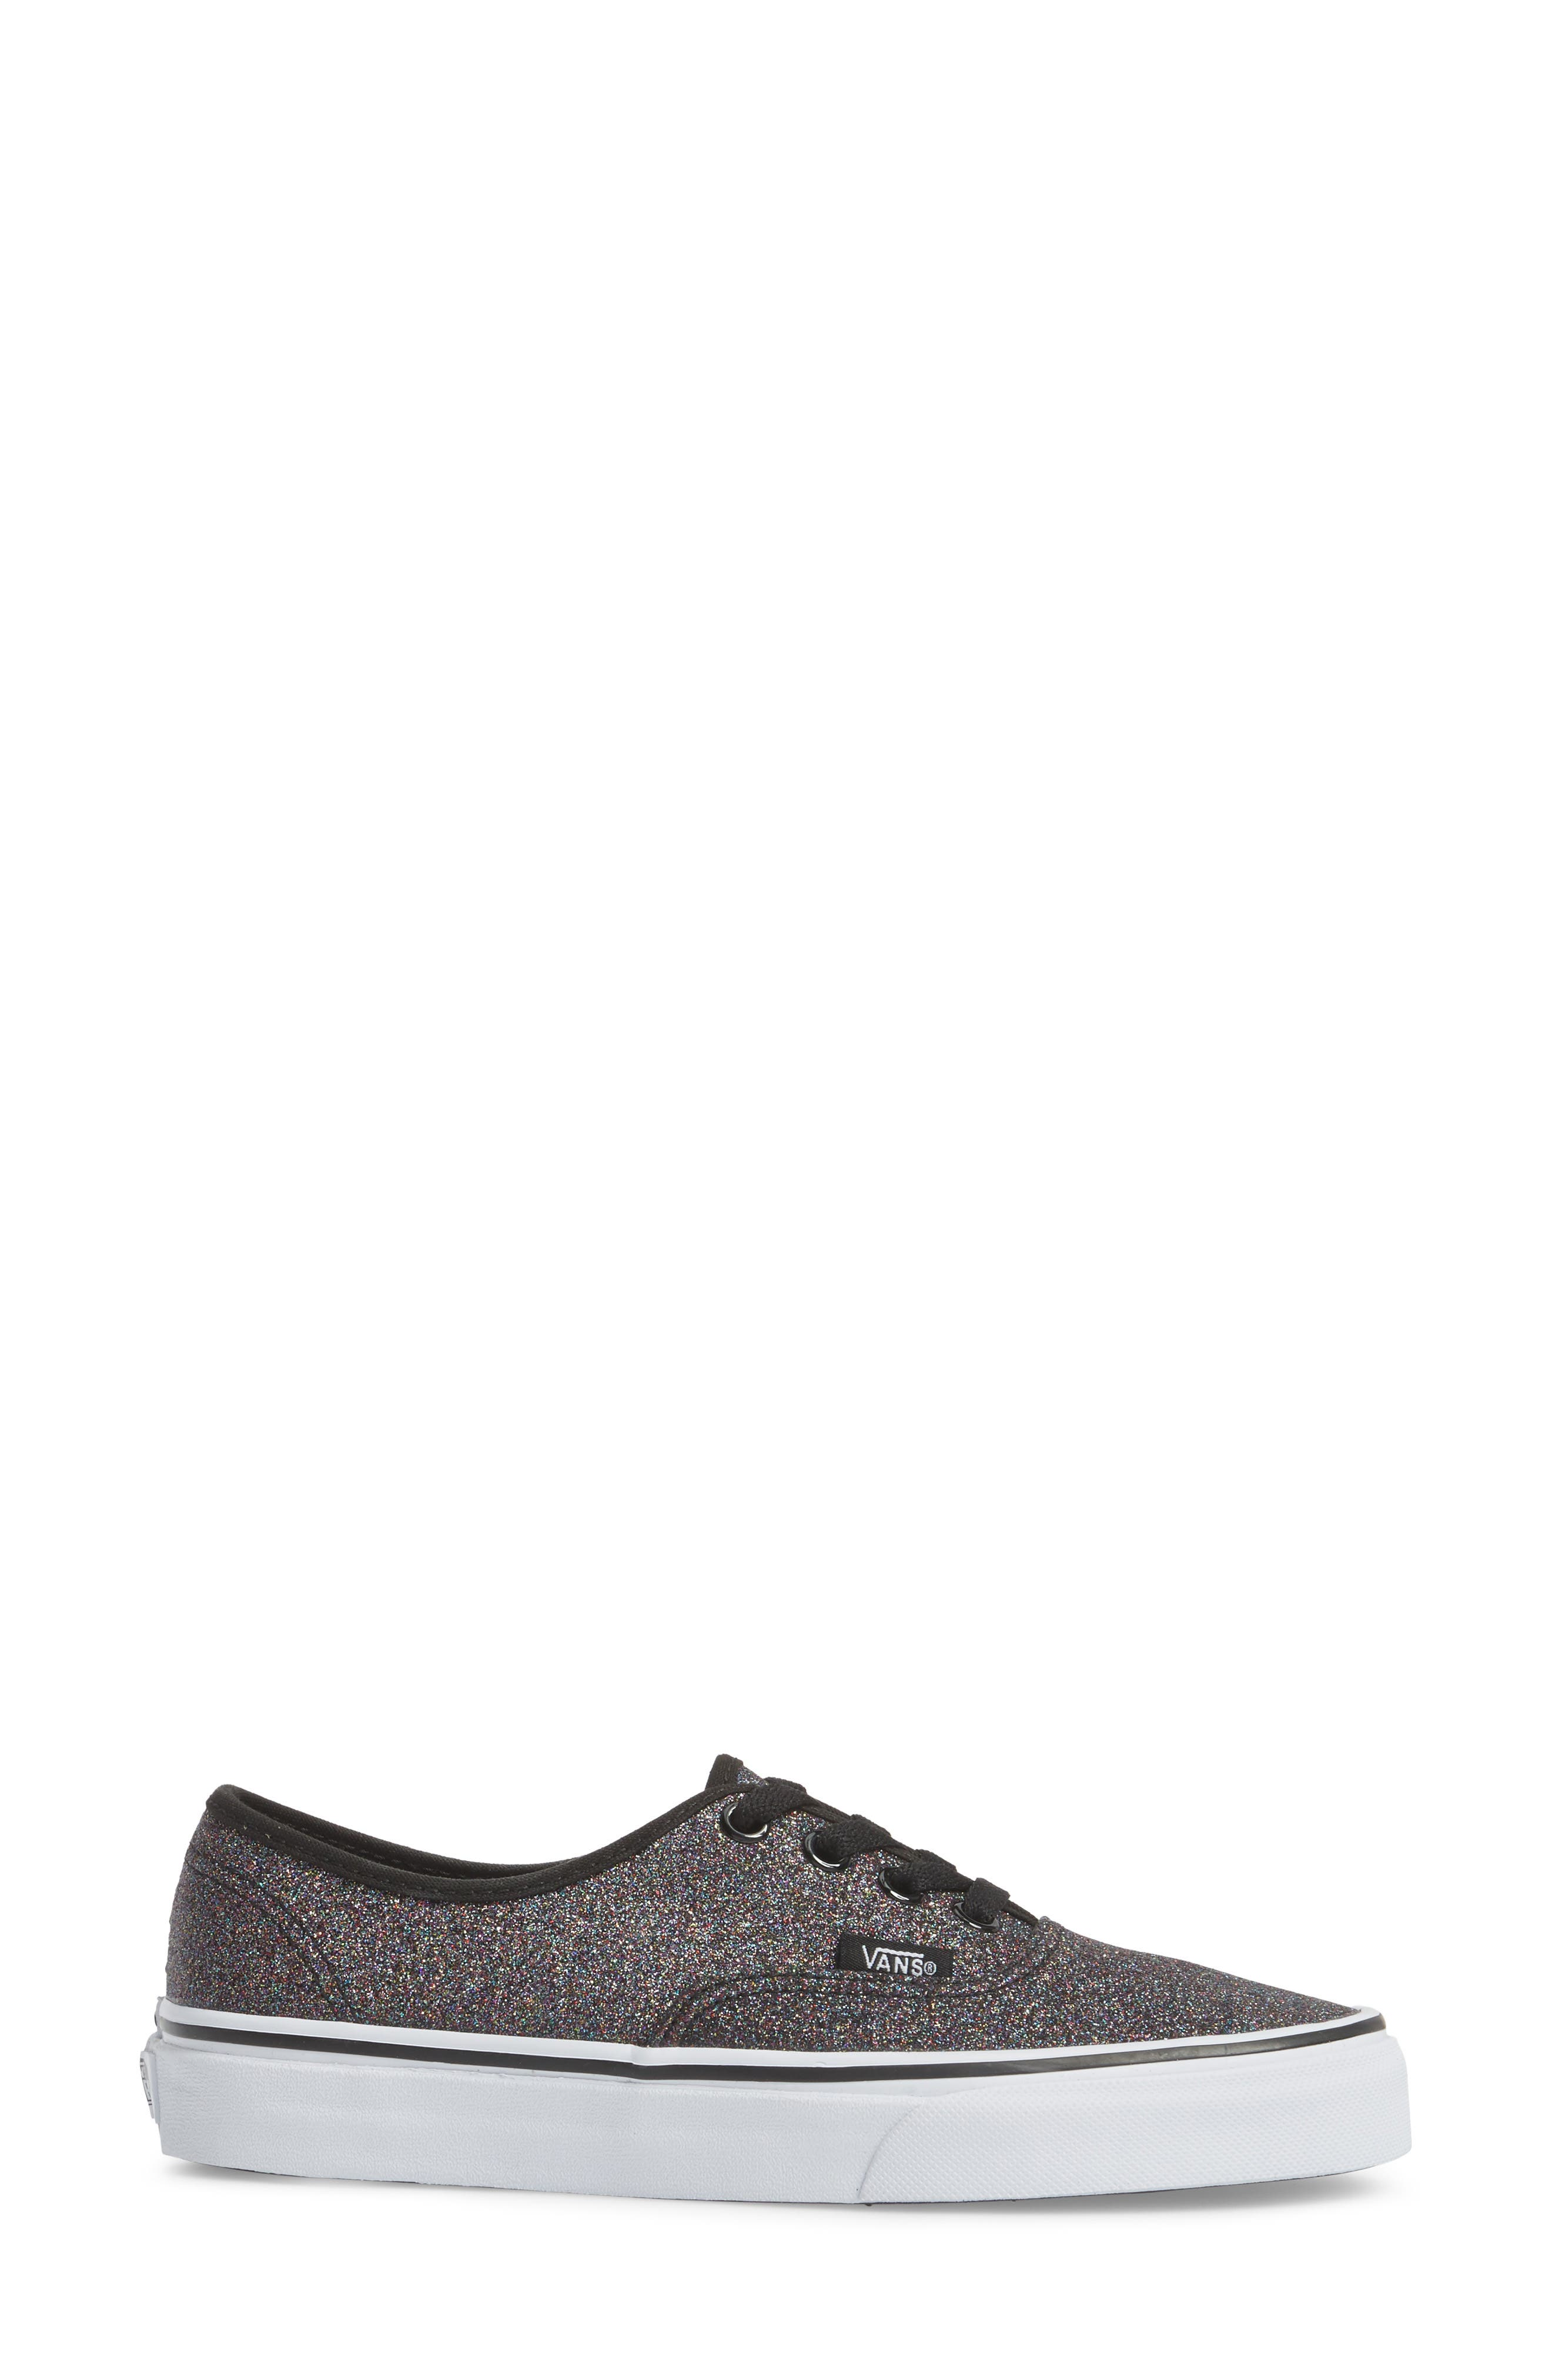 ,                             'Authentic' Sneaker,                             Alternate thumbnail 59, color,                             004